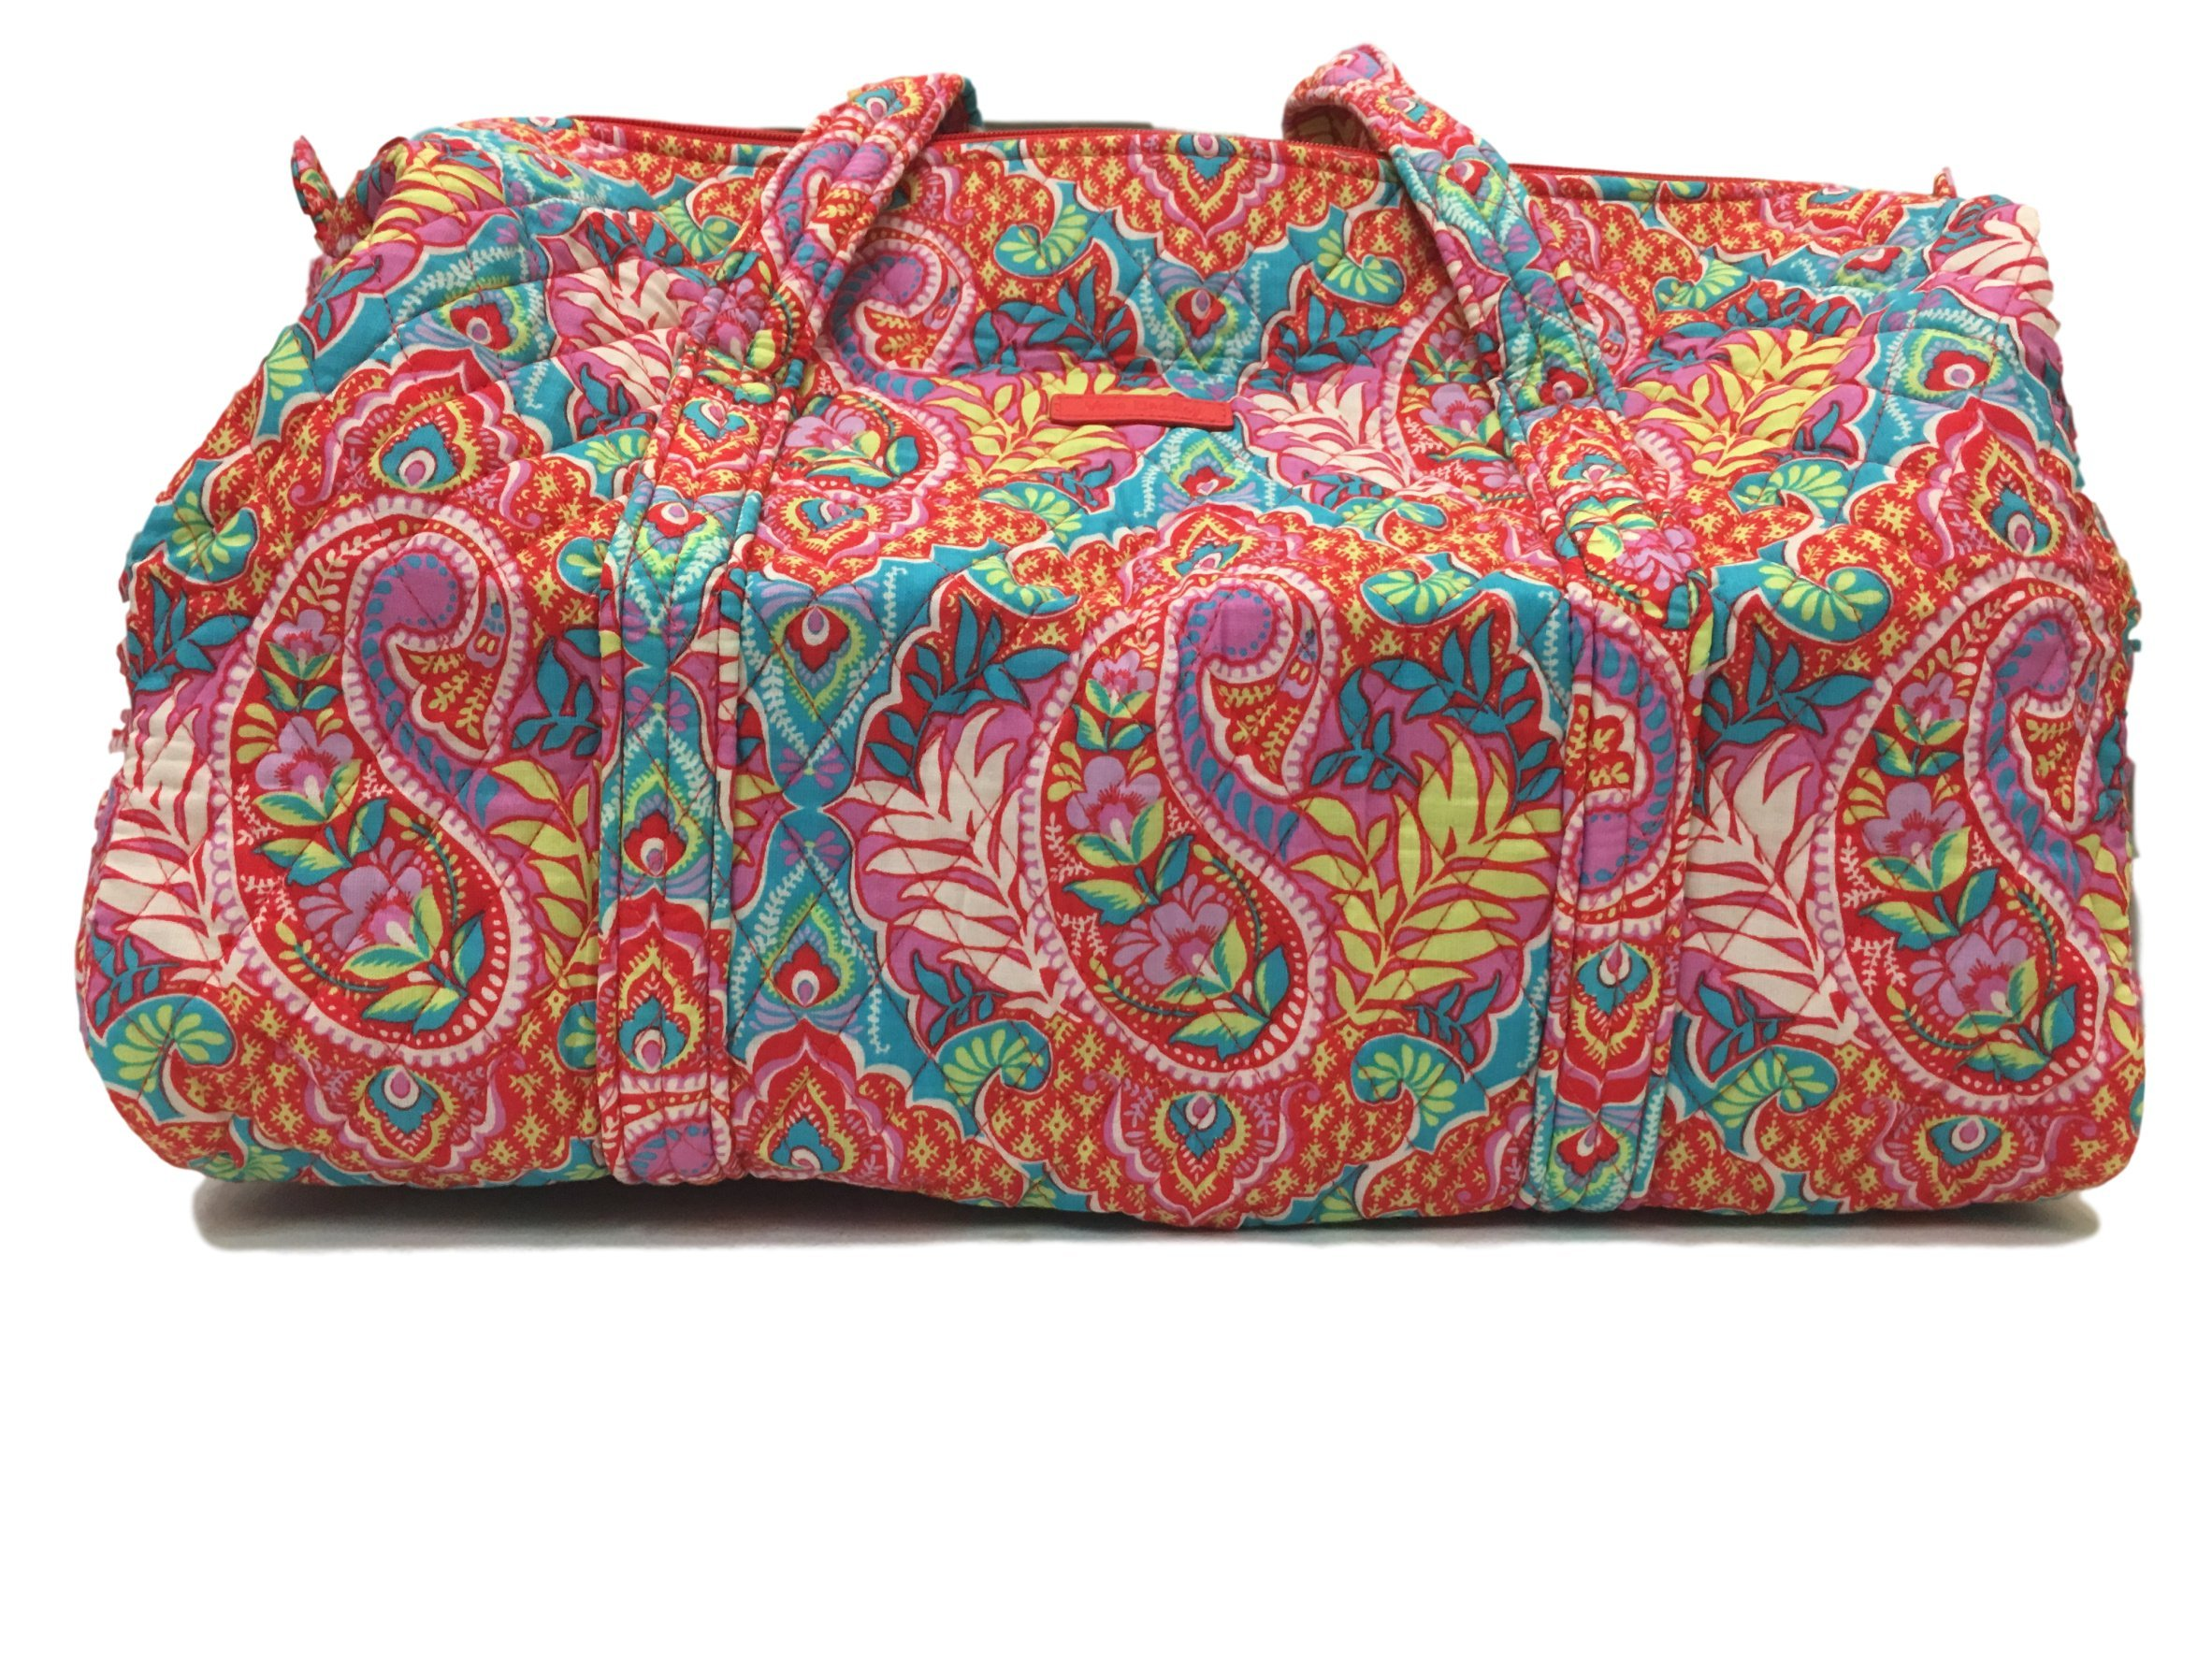 Vera Bradley Small Duffel Bag, Paisley in Paradise